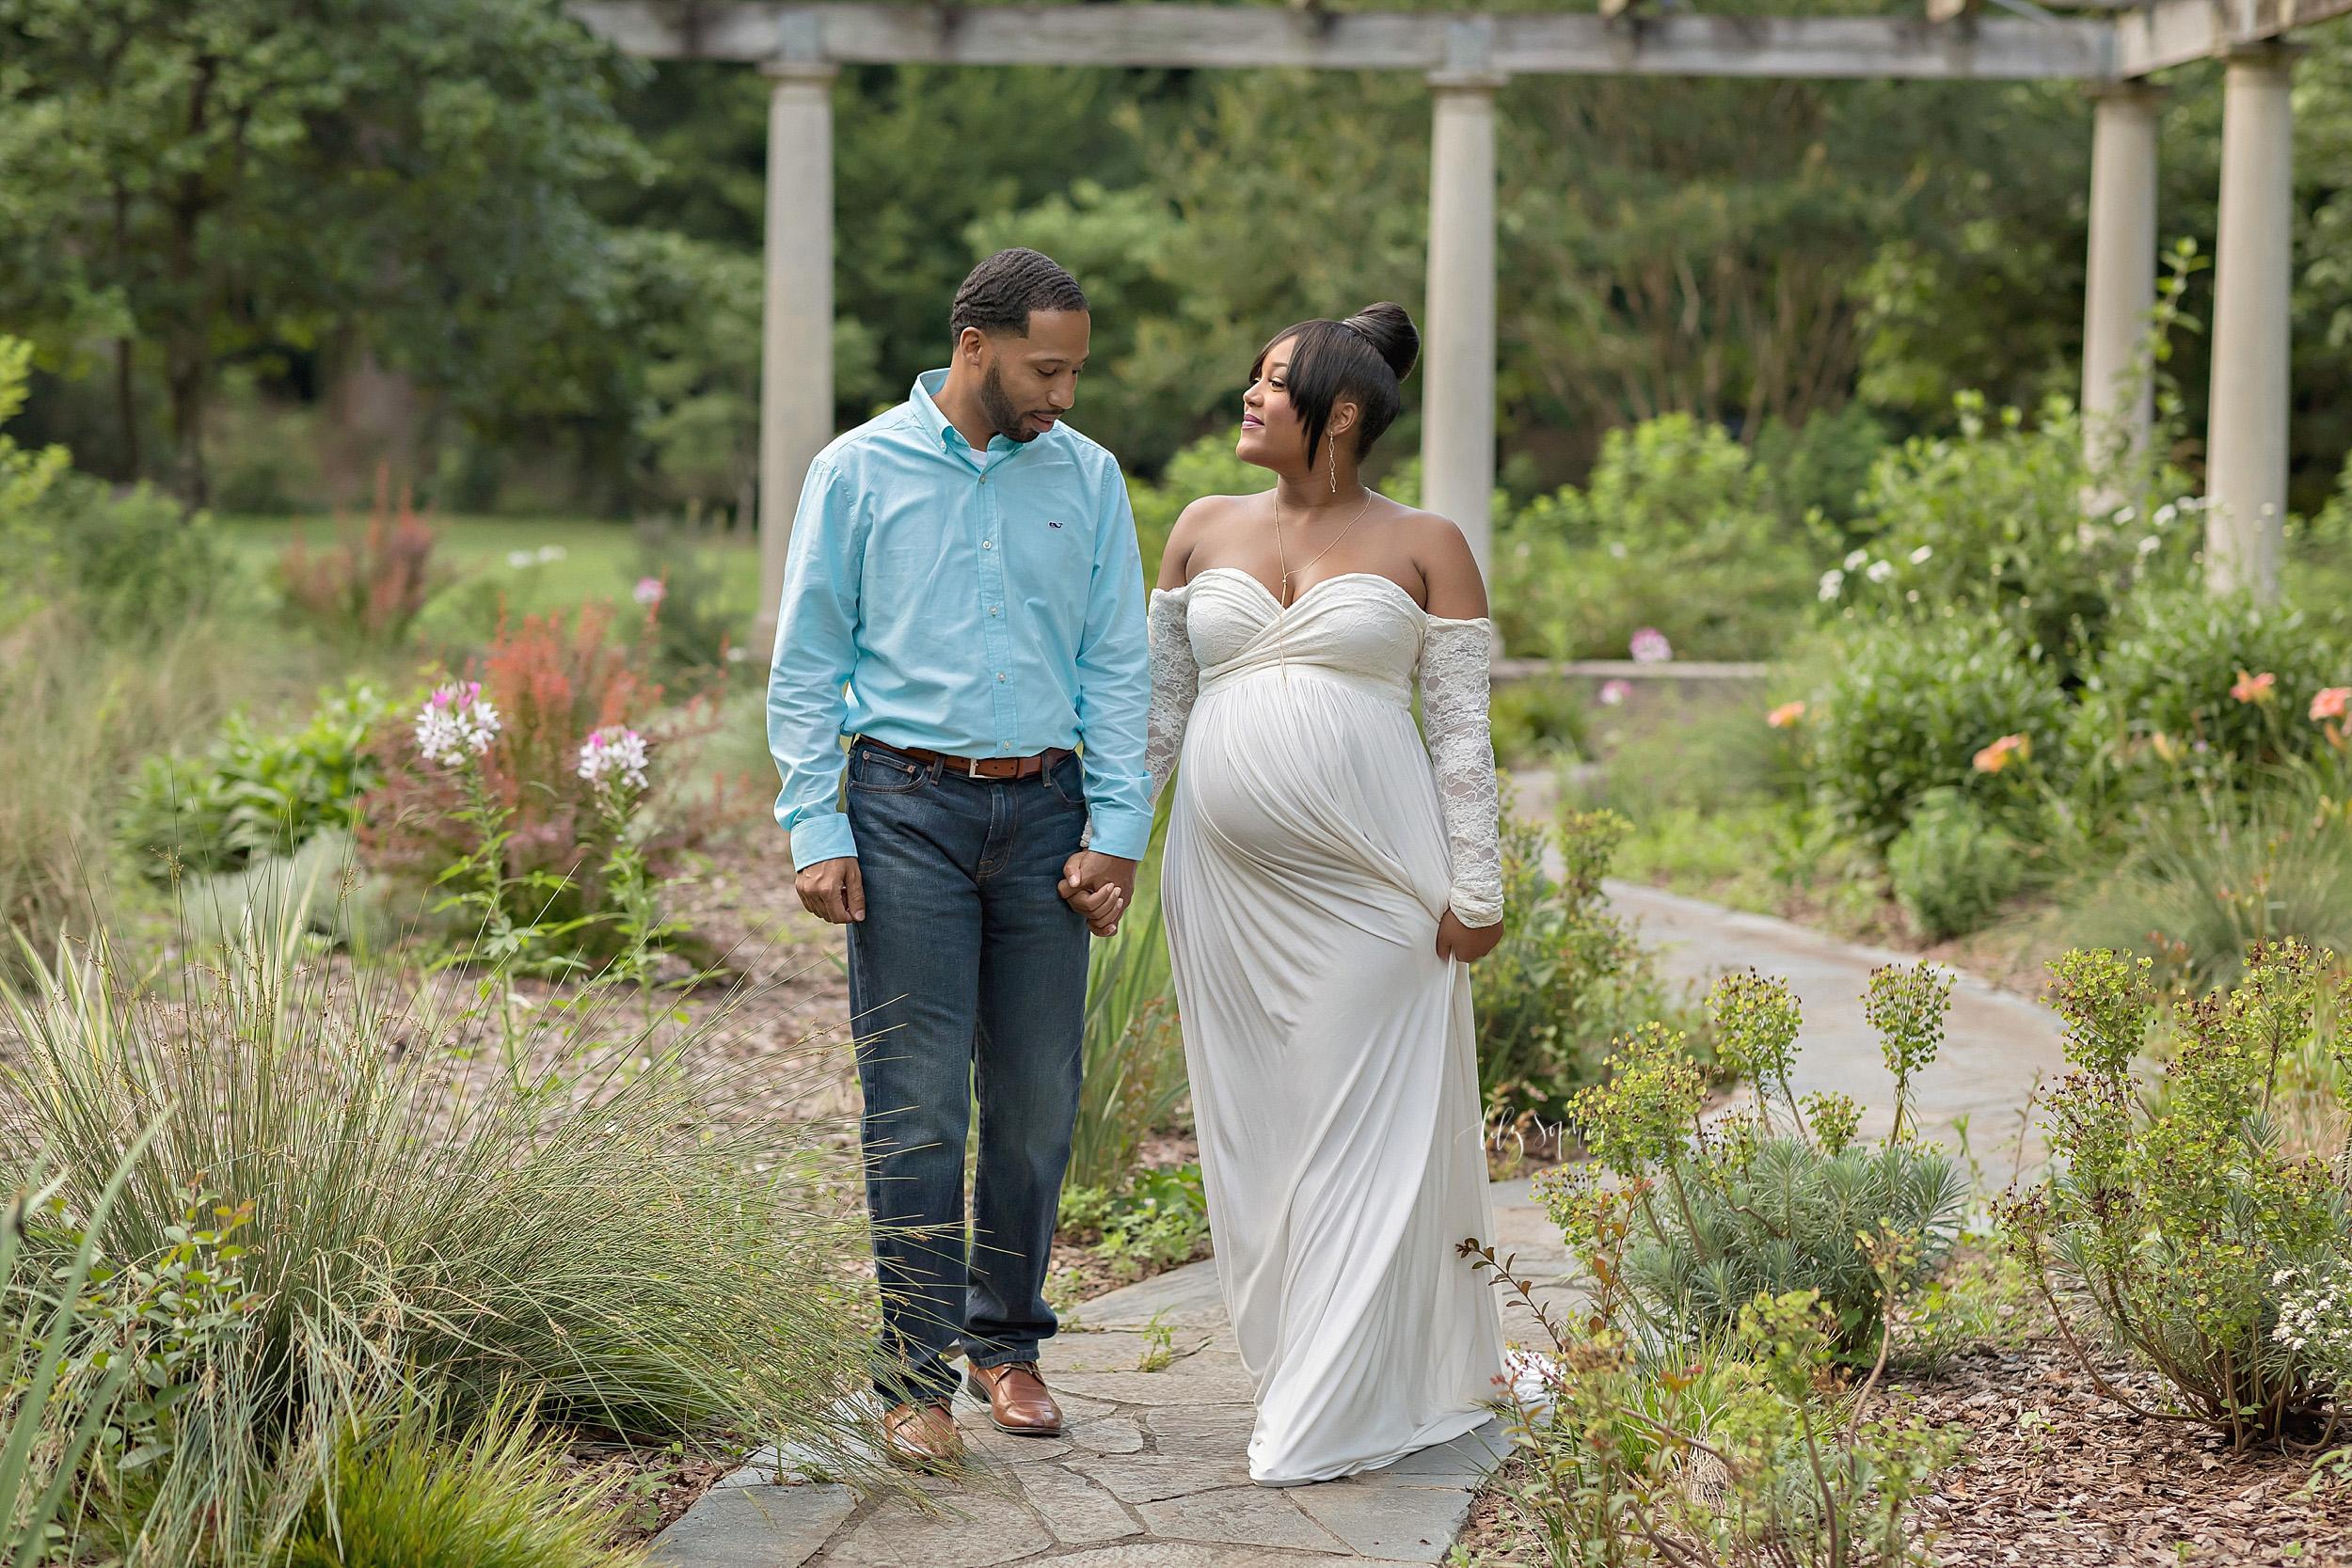 atlanta-buckhead-acworth-brookhaven-lily-sophia-photography-baby-maternity-photographer-maternity-portraits-outdoor-gardens-sunset-grant-park-intown-pregnant-expecting-baby-boy_0221.jpg